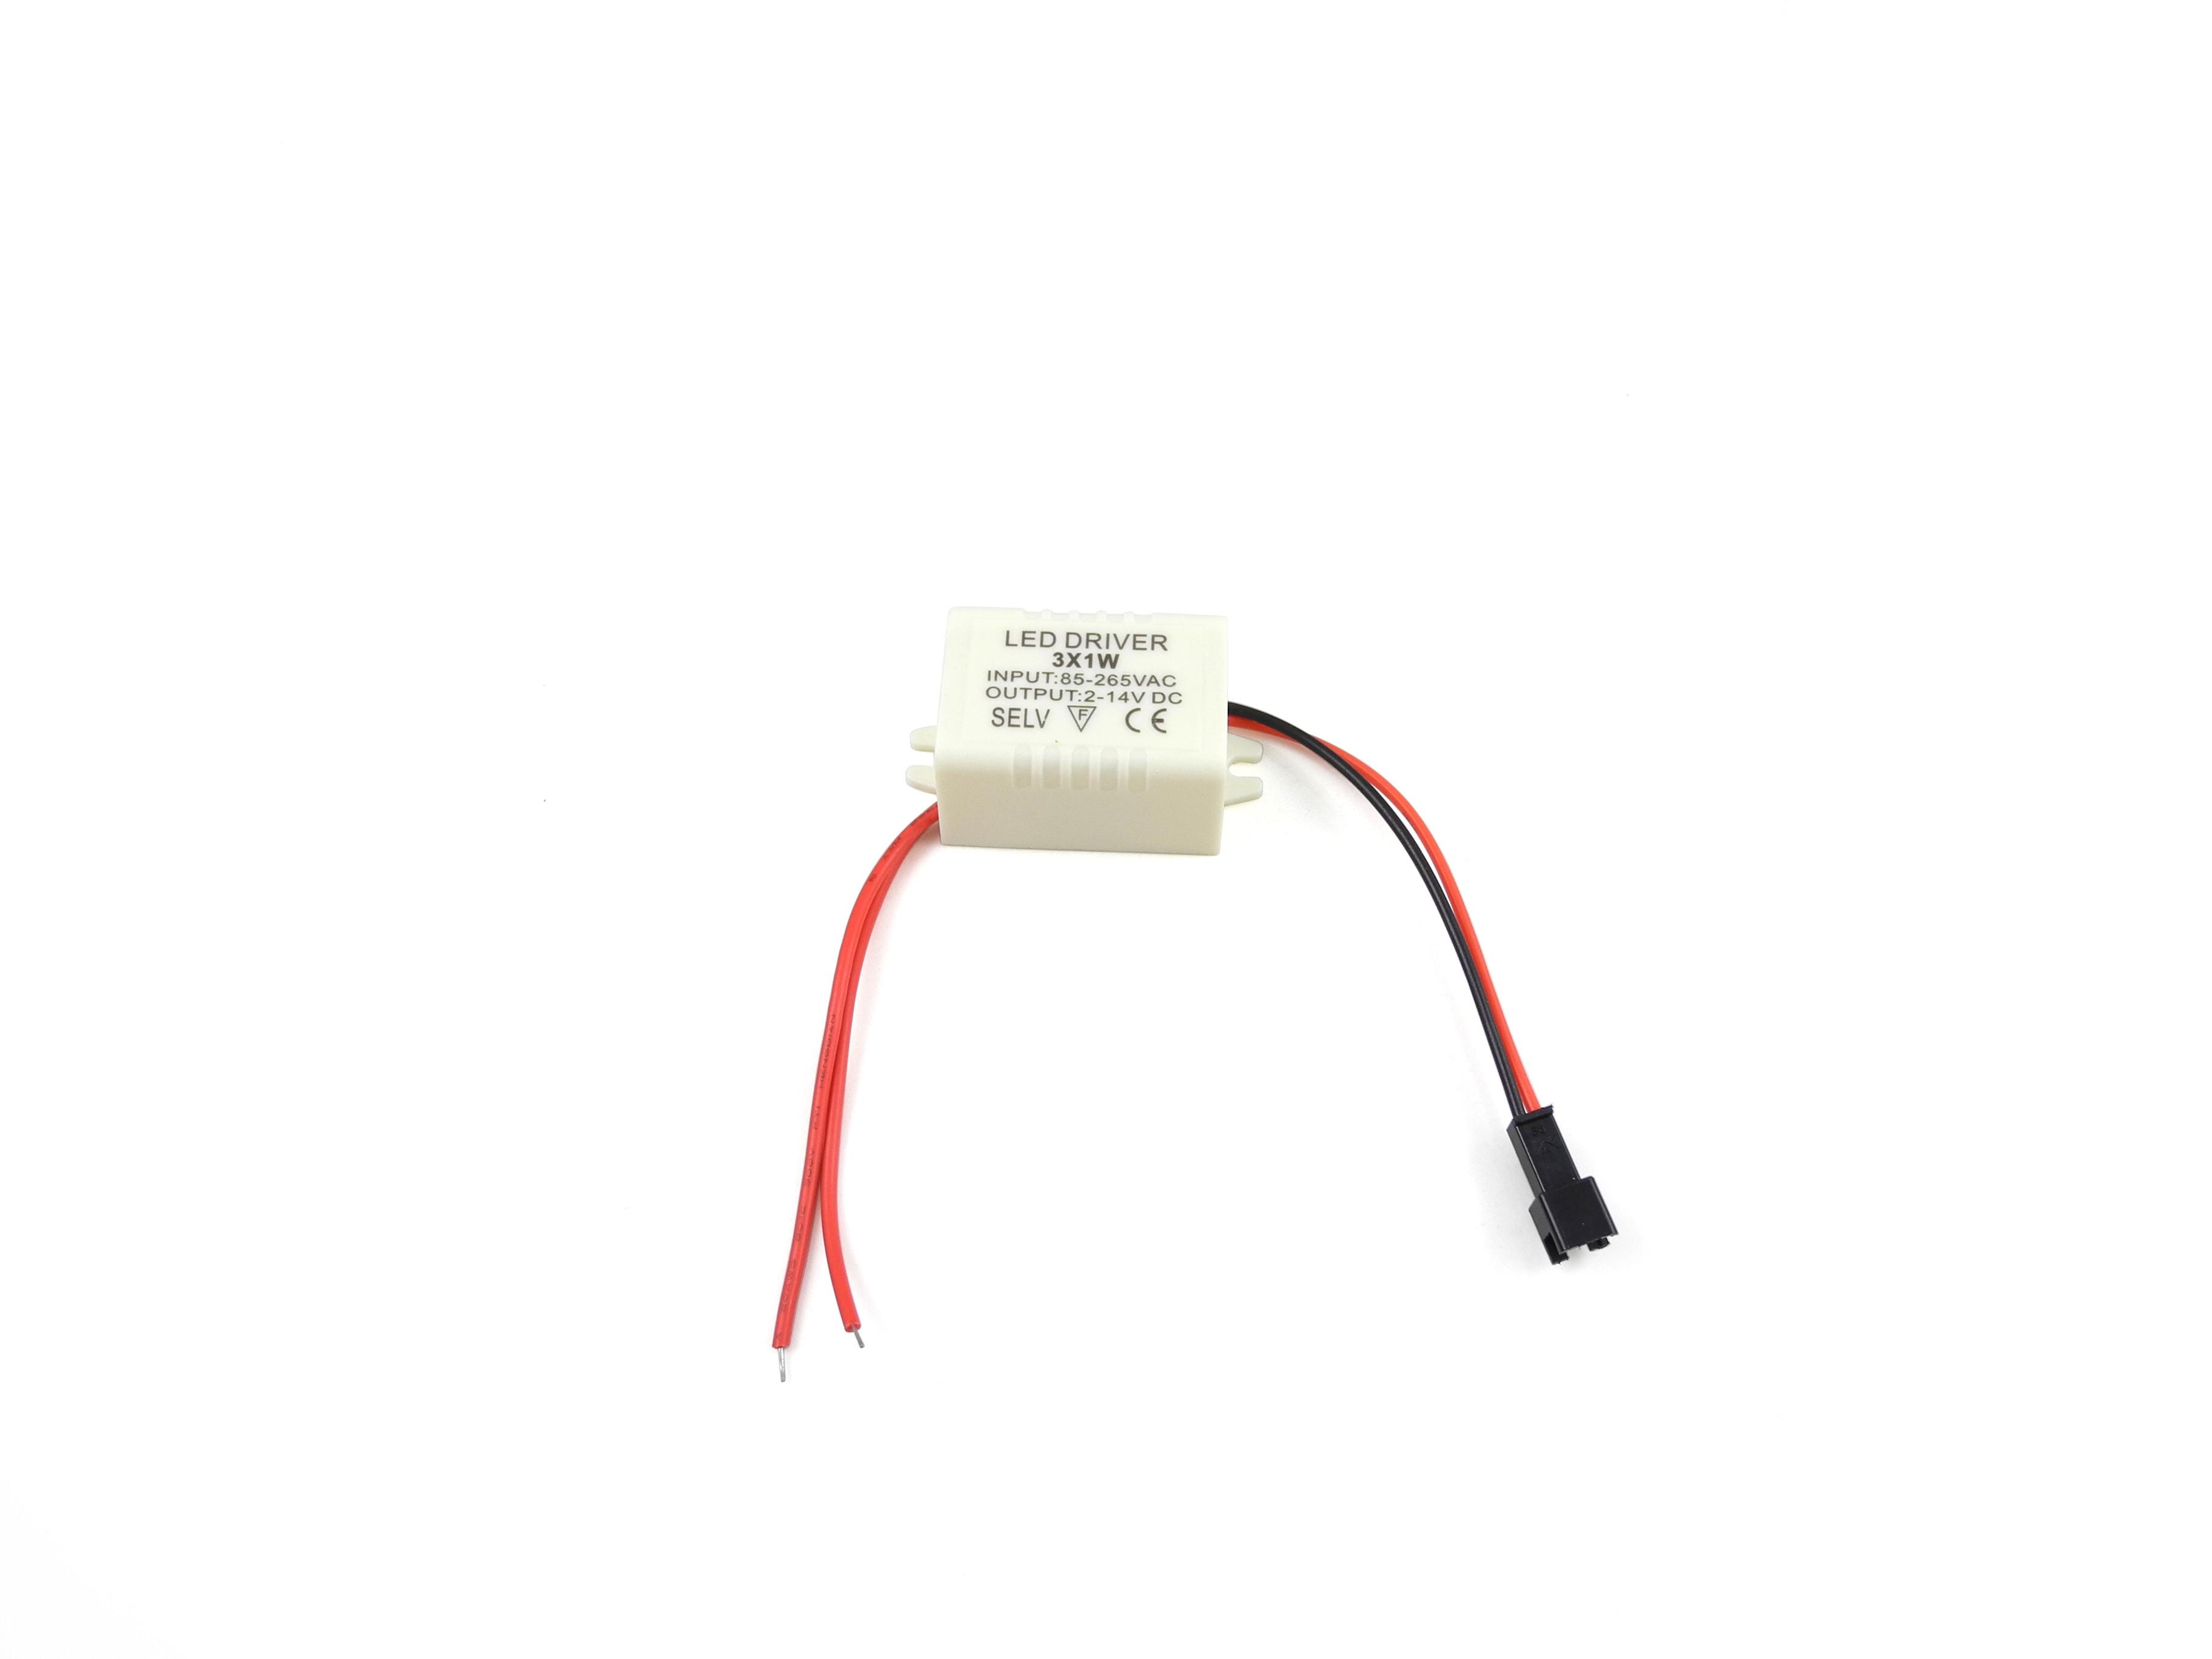 3 X 1w Led Driver Power Supply Transformer Ac 85 265v Dc 2 14v 512v 300ma Circuit 3w Buy 3wled Mengs Ld 001